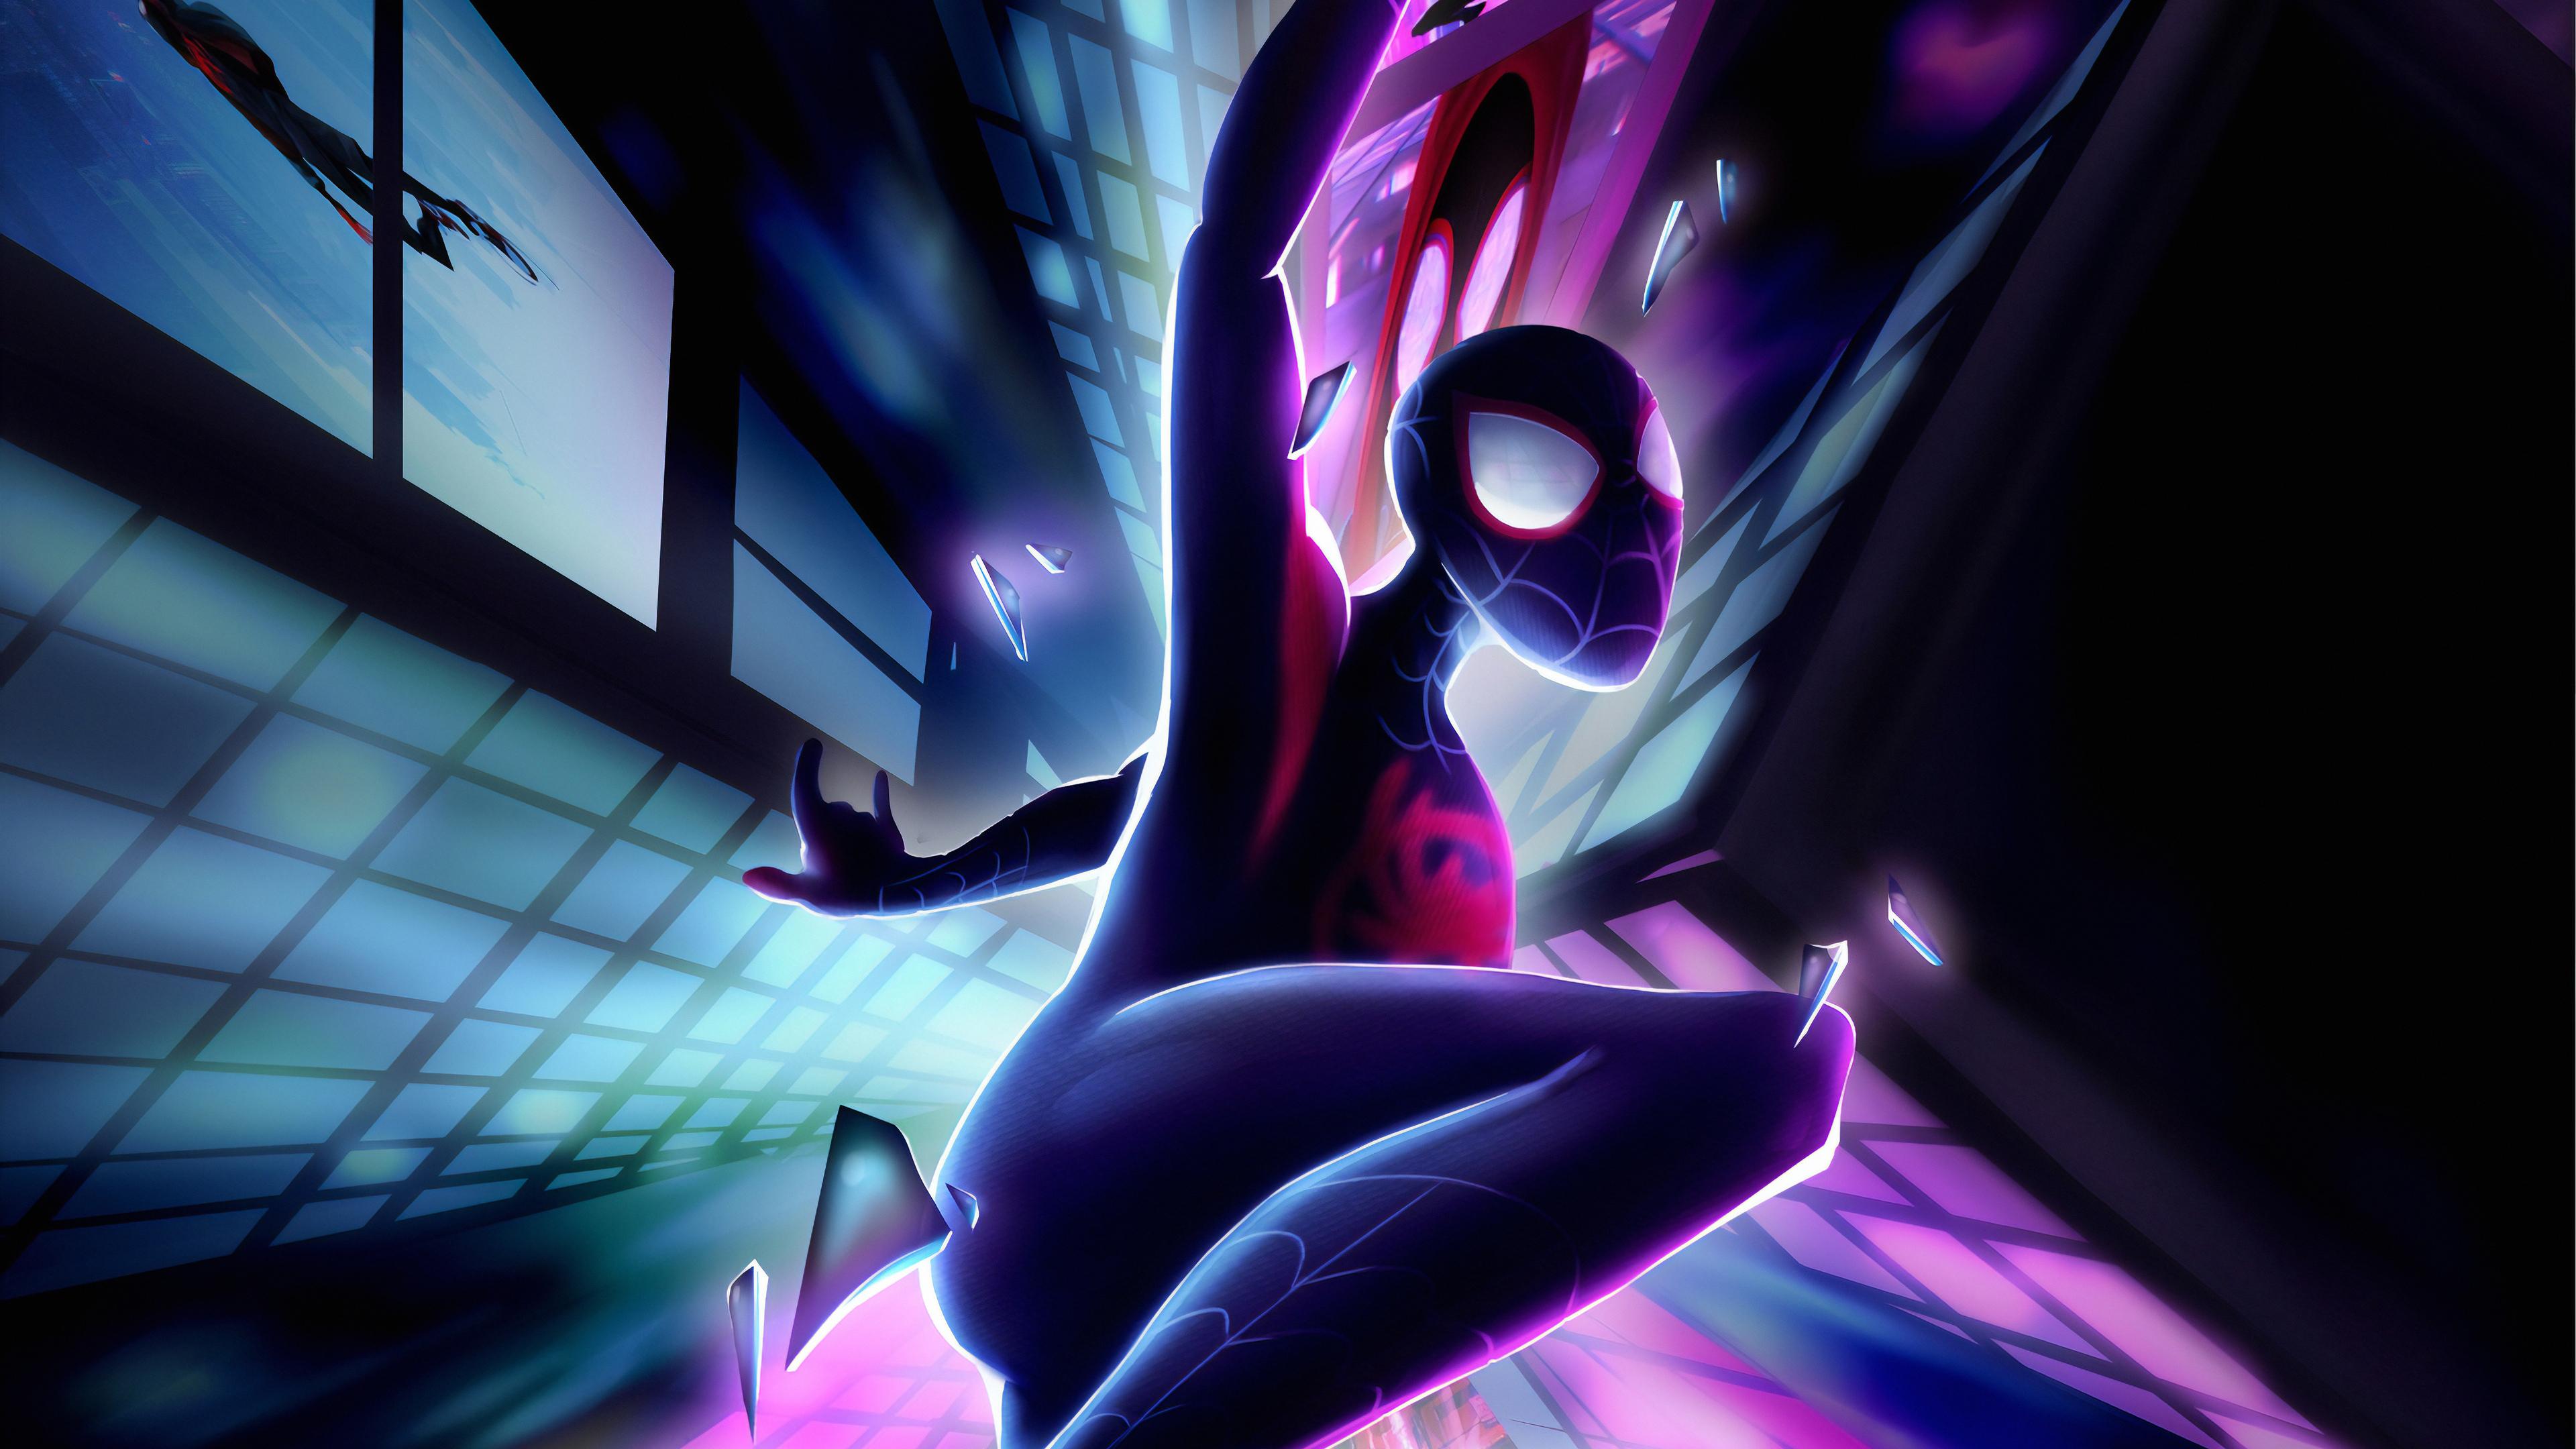 spiderman miles away 1570918383 - Spiderman Miles Away - superheroes wallpapers, spiderman wallpapers, hd-wallpapers, digital art wallpapers, artwork wallpapers, art wallpapers, arstation wallpapers, 4k-wallpapers